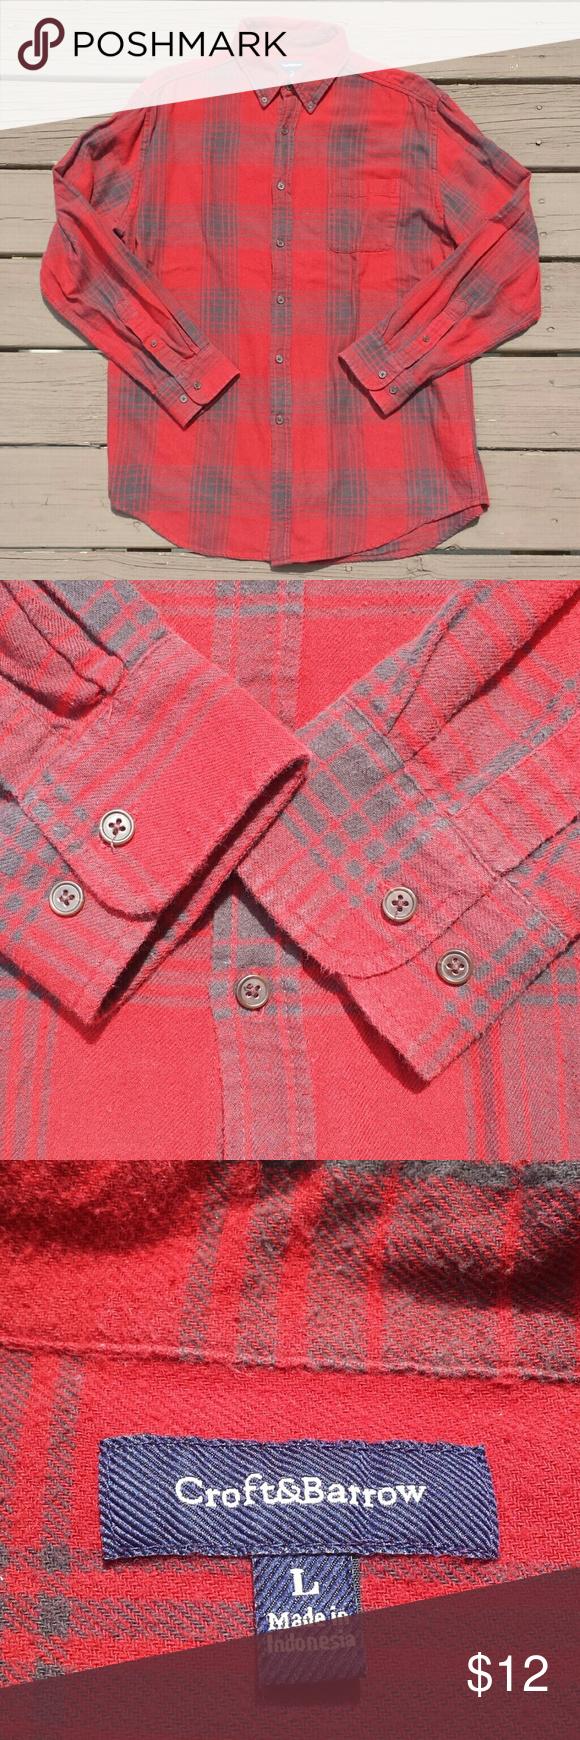 Flannel shirt black  Red and Black Plaid Lumberjack Flannel Shirt  My Posh Picks